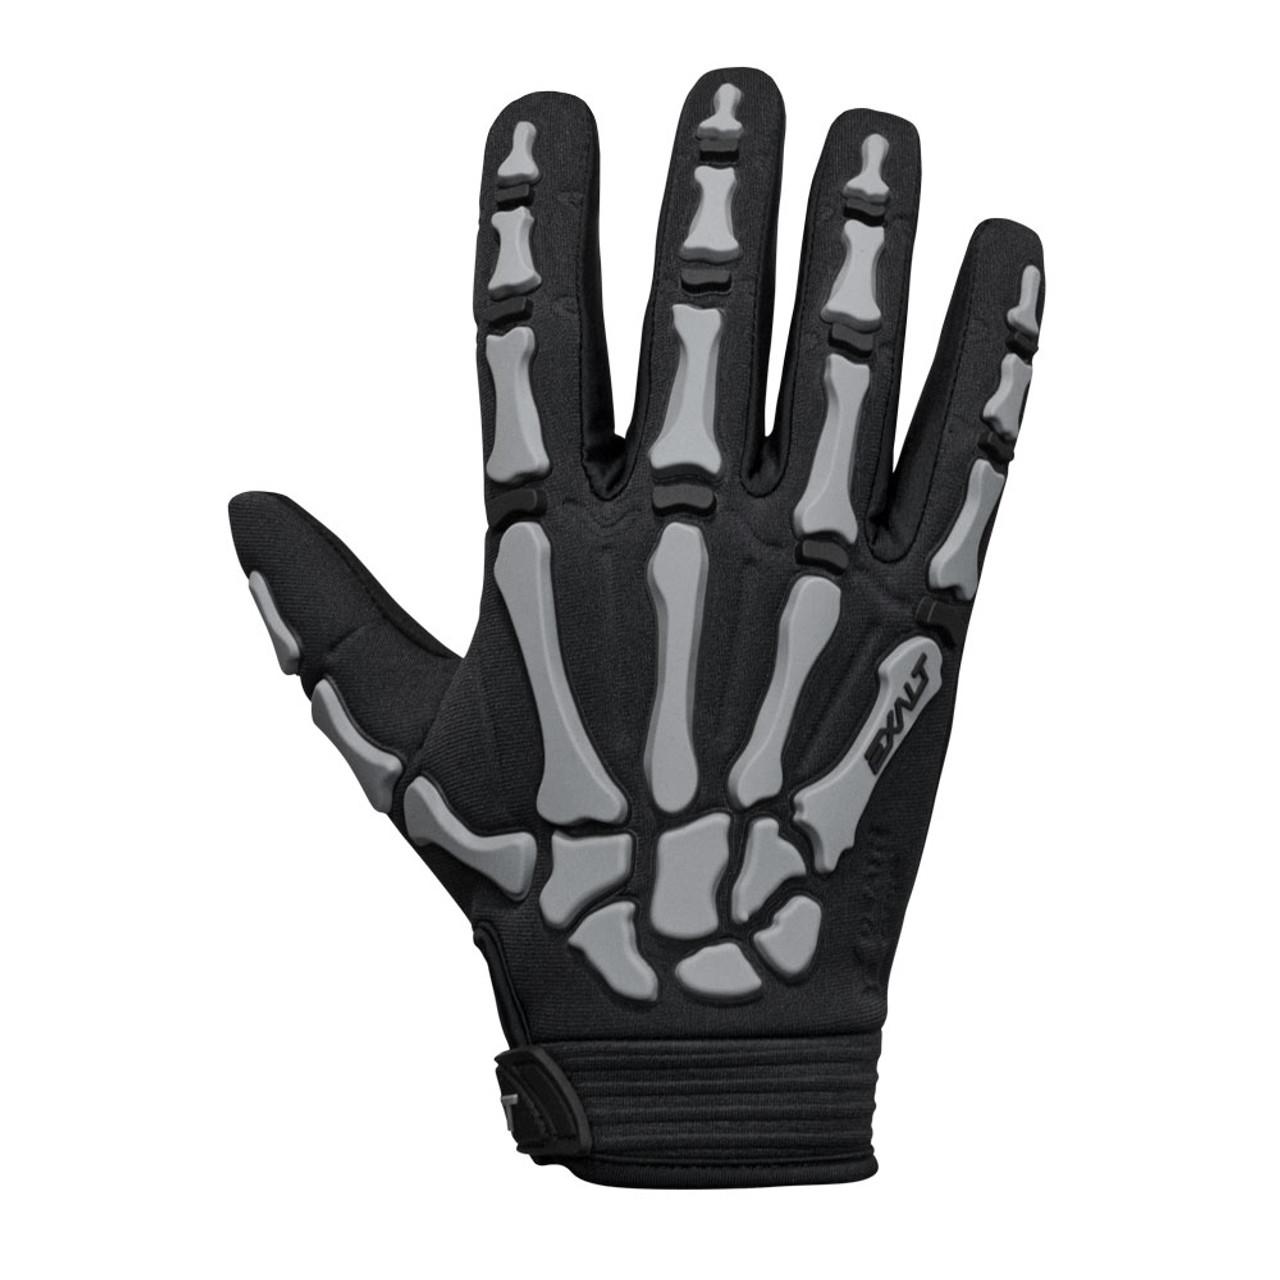 Exalt Death Grip Gloves Grey / Full Finger